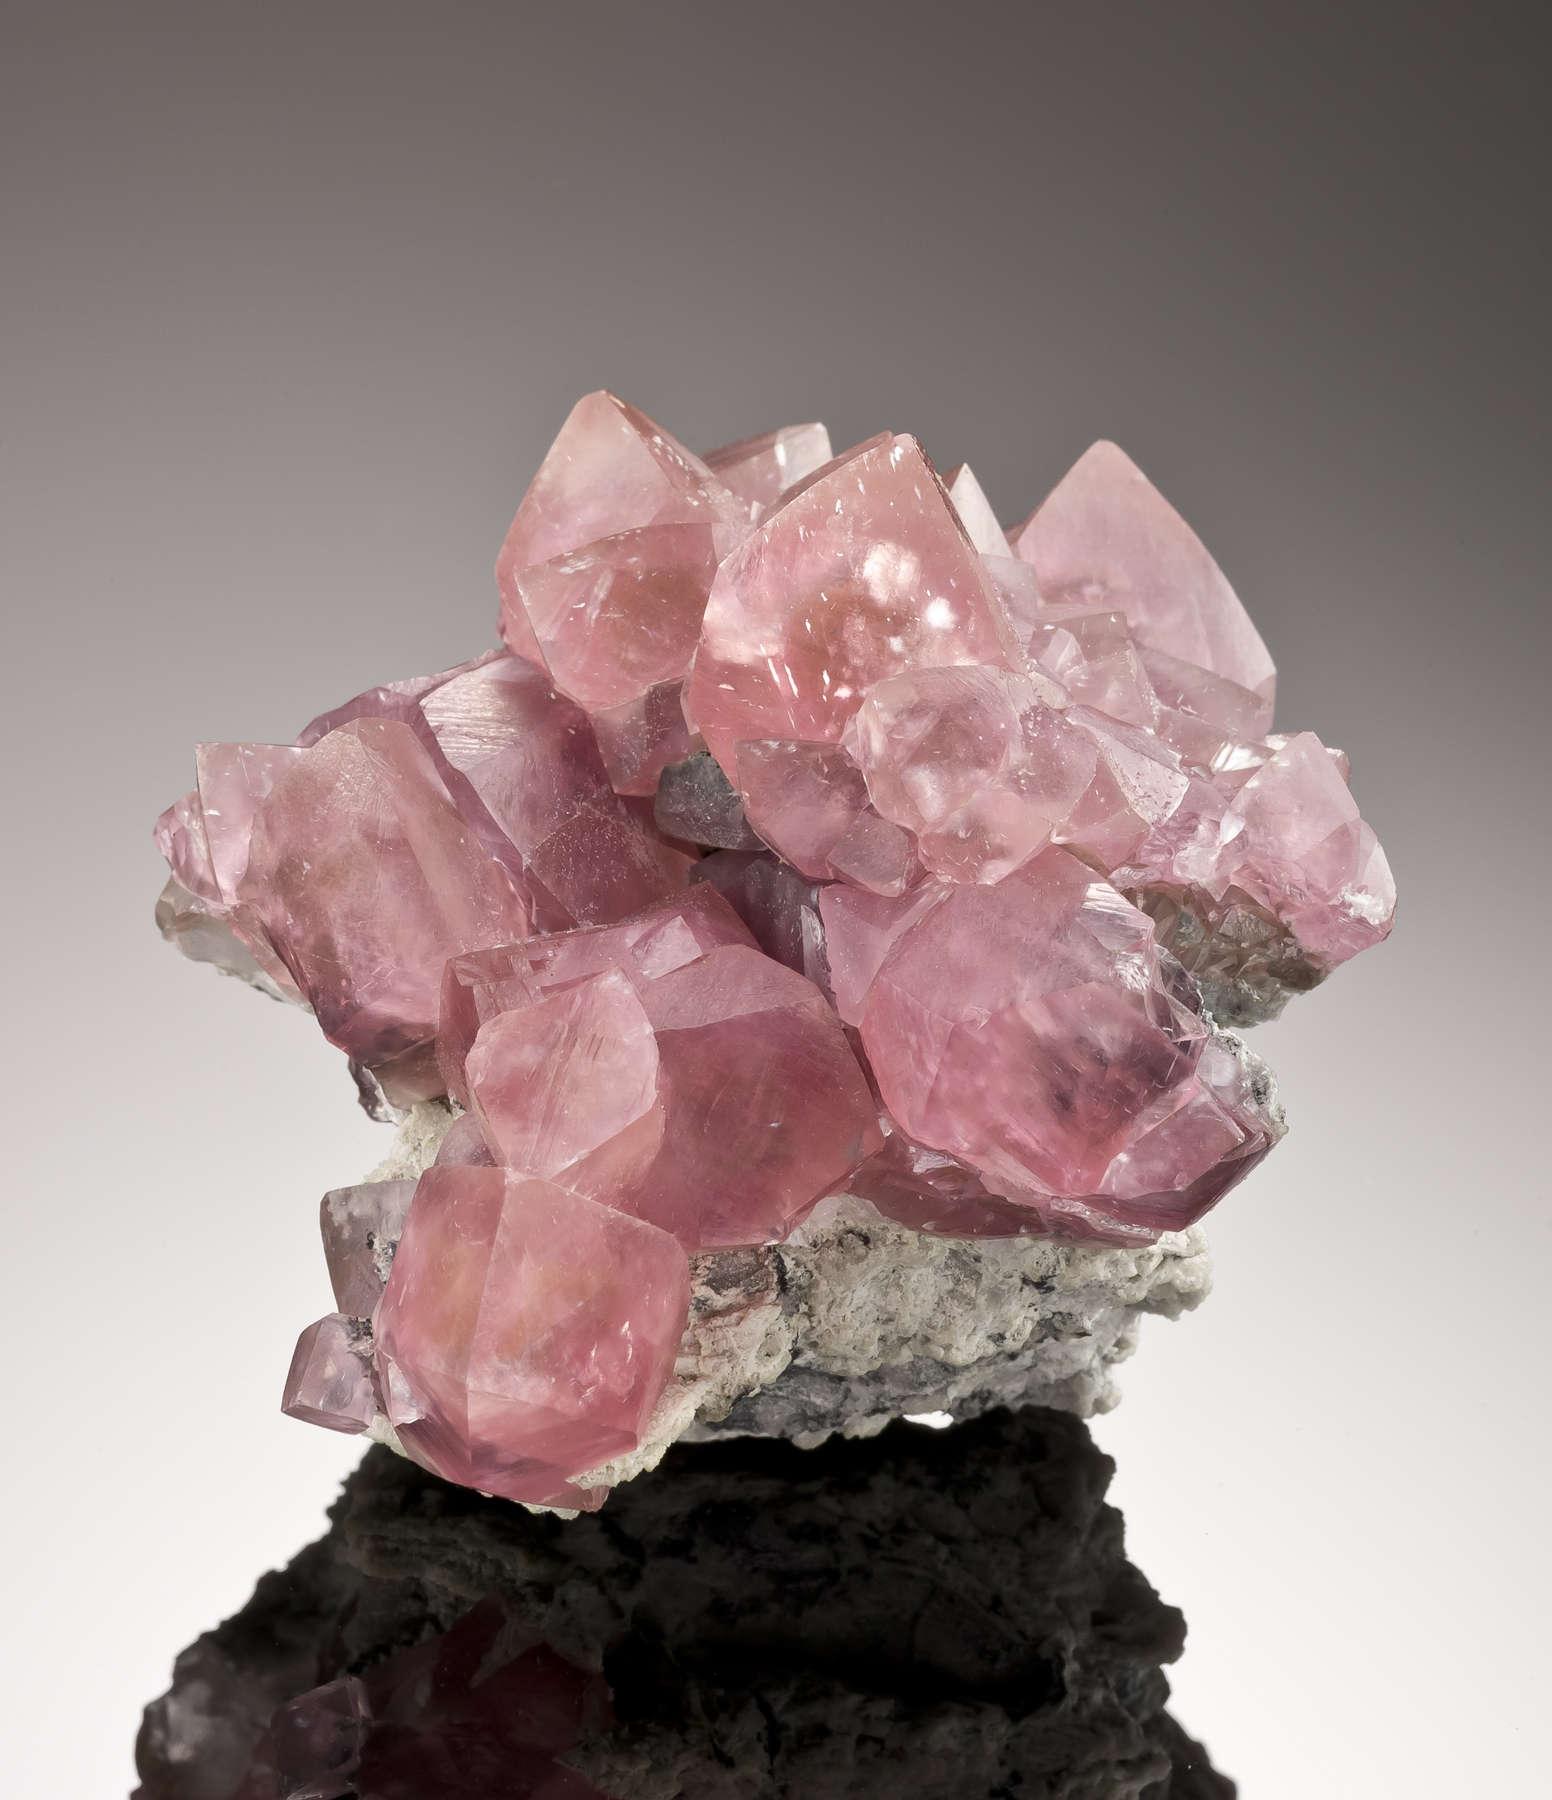 Sharp crystals classic soft pink smithsonite like Tsumeb late 1960s